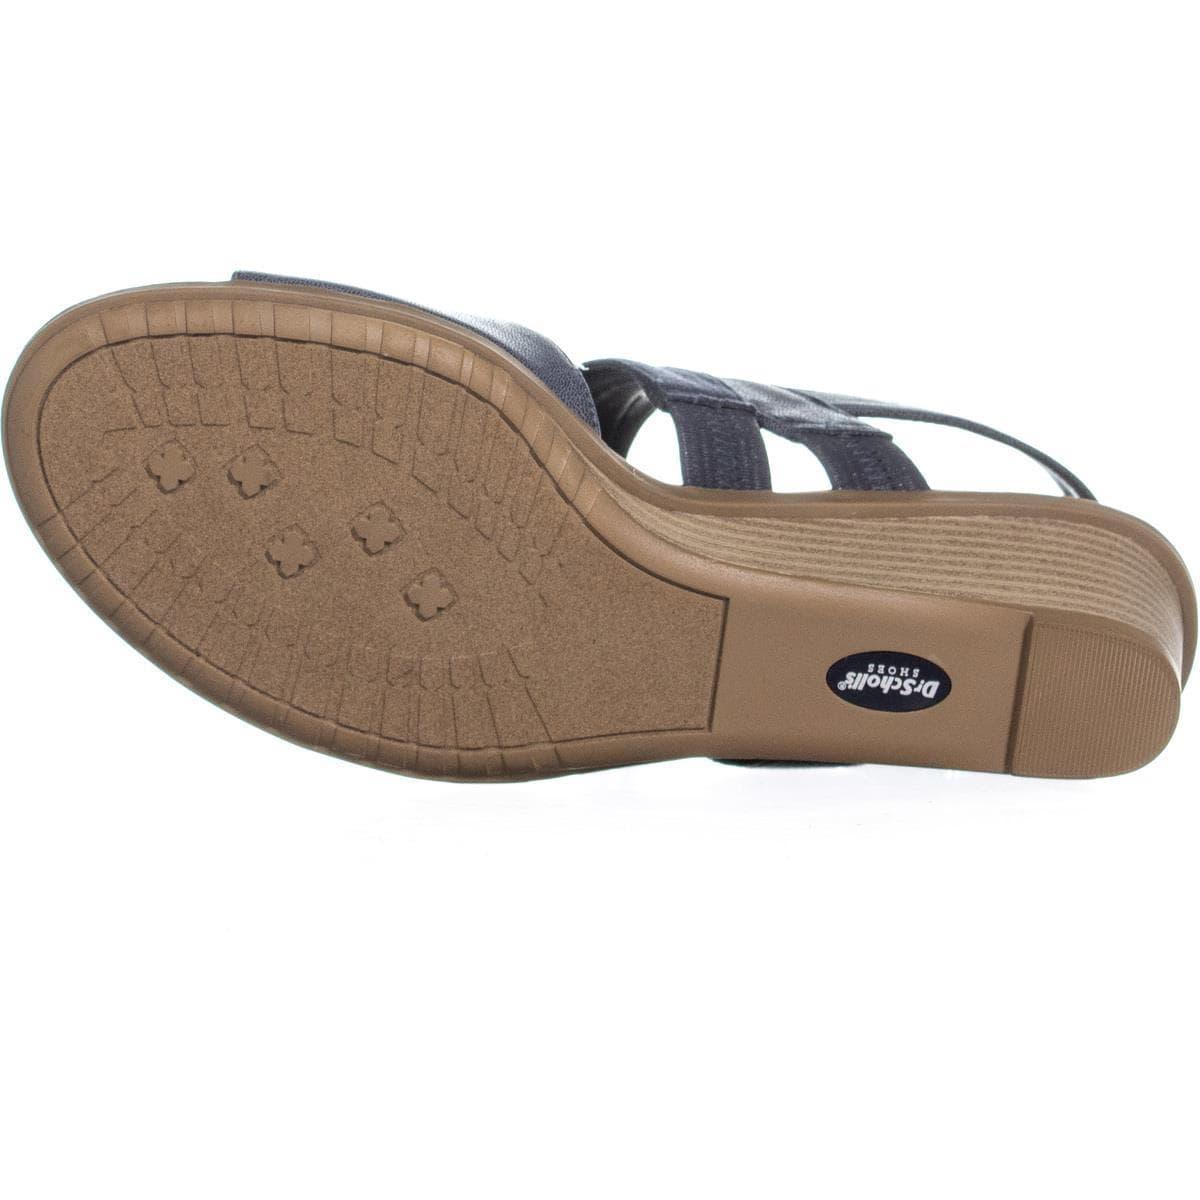 13c269b8635b Shop Dr. Scholl s Essential Collection Grace Wedge Sandals